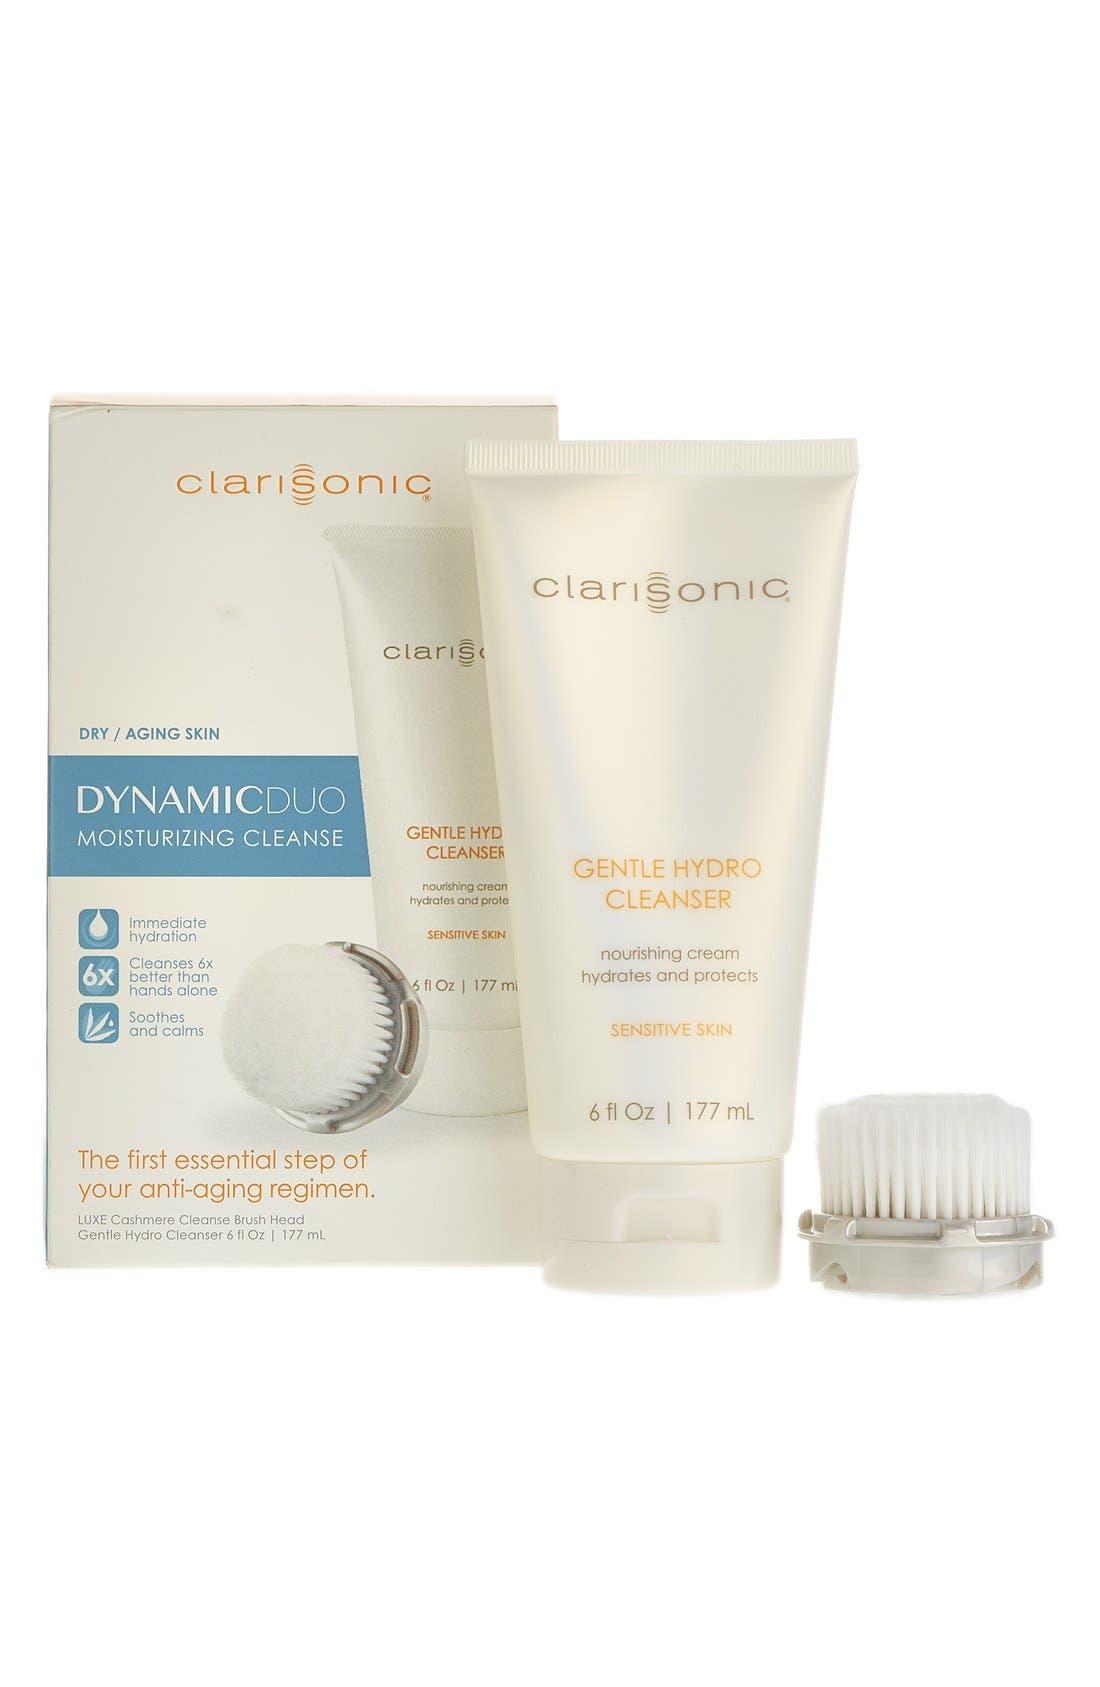 CLARISONIC 'Dynamic Duo' Moisturizing Cleanse Set ($55 Value)